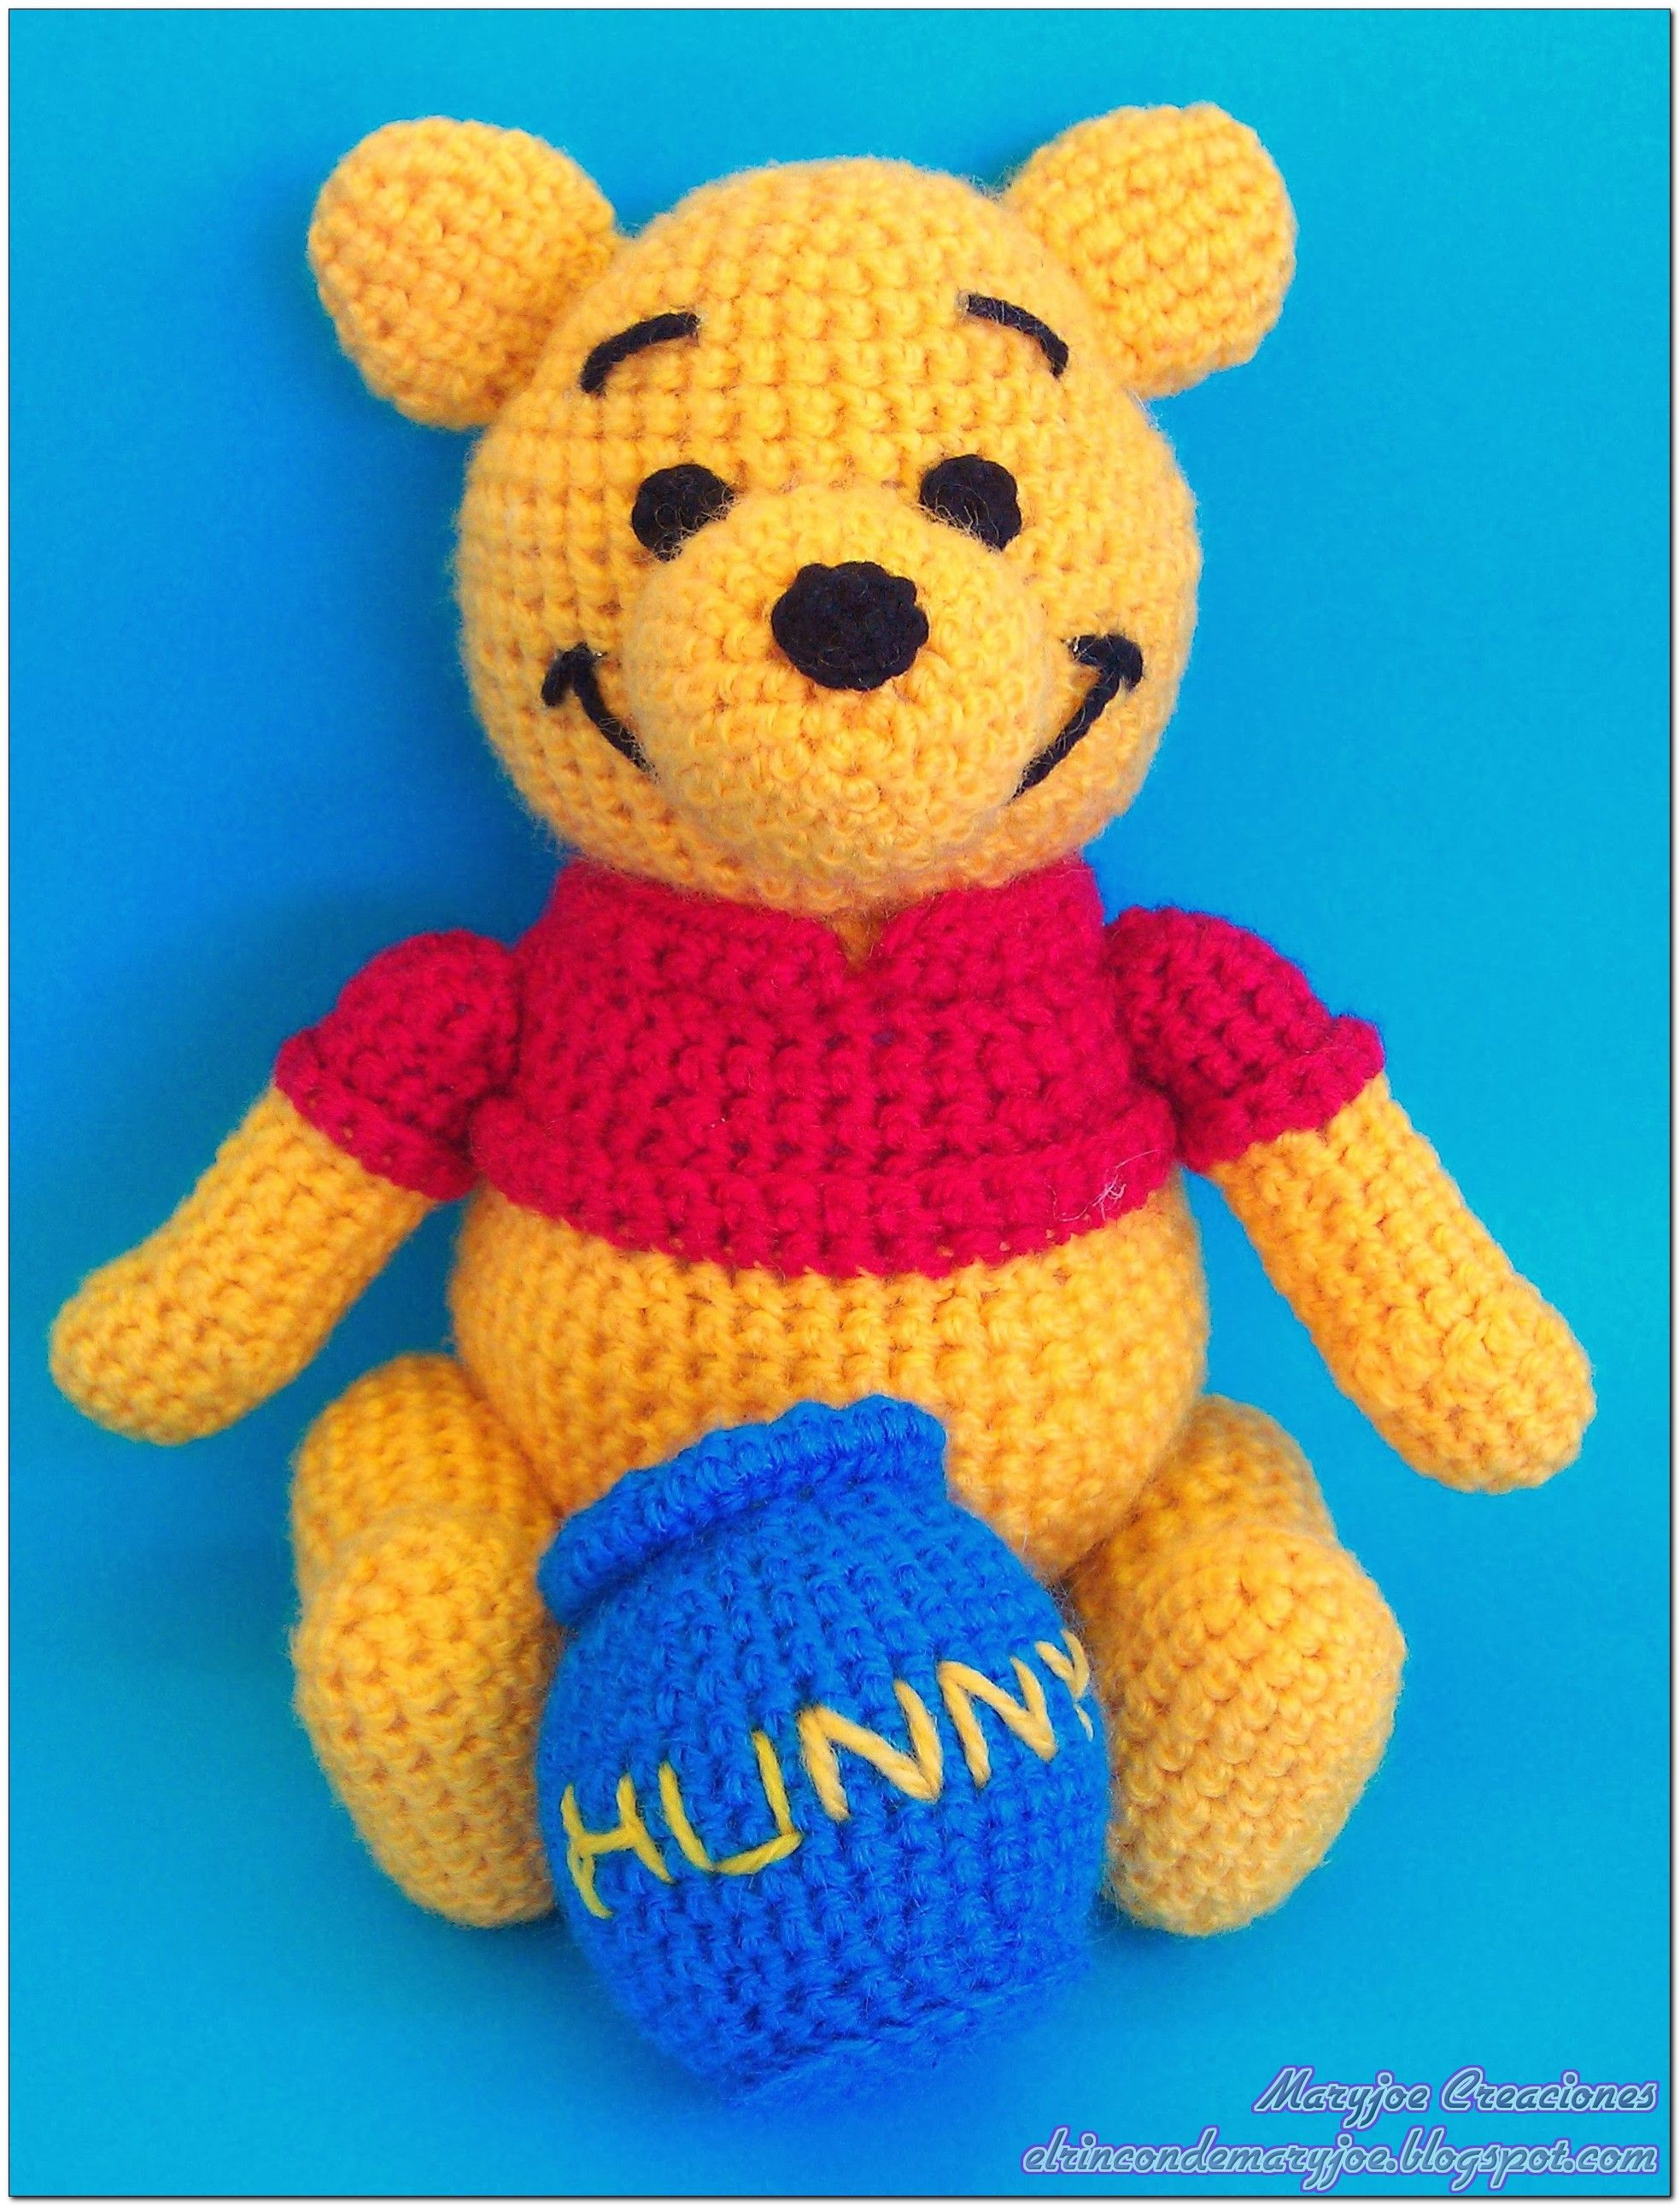 Winnie The Pooh And Friends Amigurumi : Amigurumi Winnie the Pooh Amigurumi Pinterest